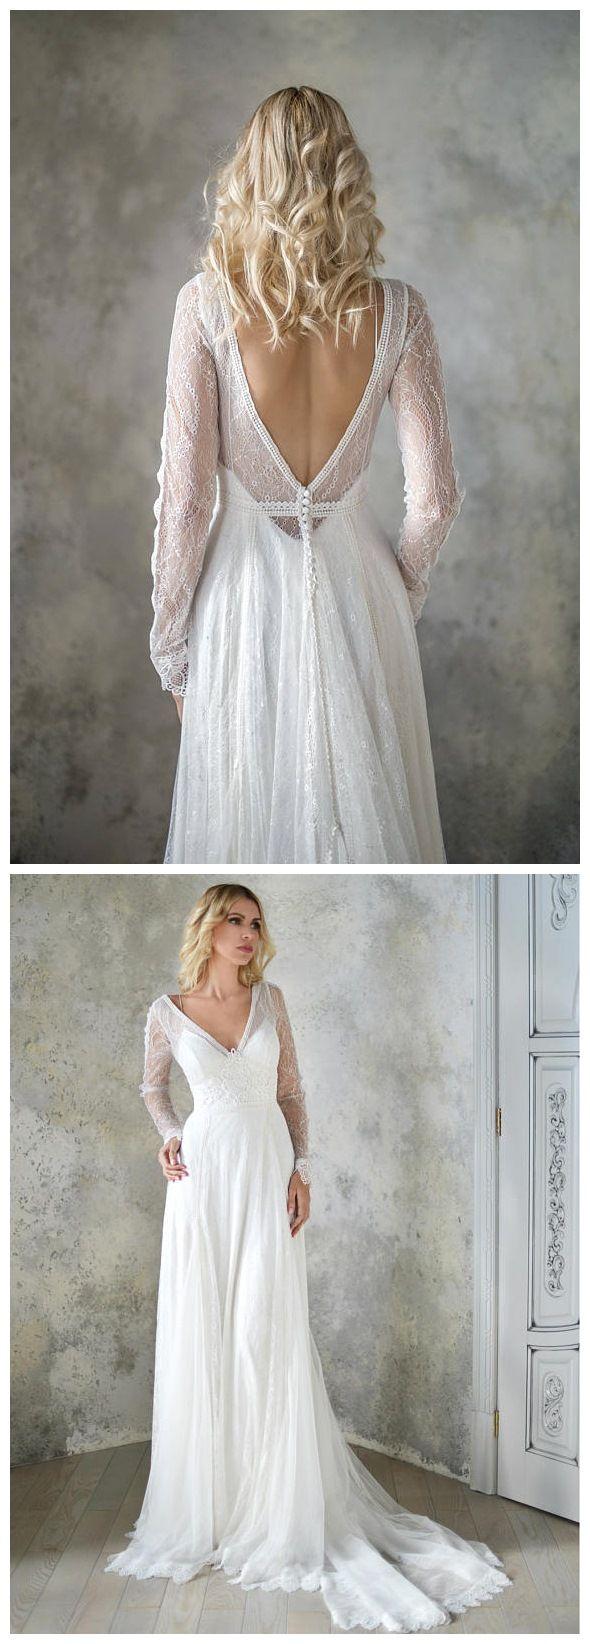 Long sleeve ivory lace beach wedding dresses backless boho wedding